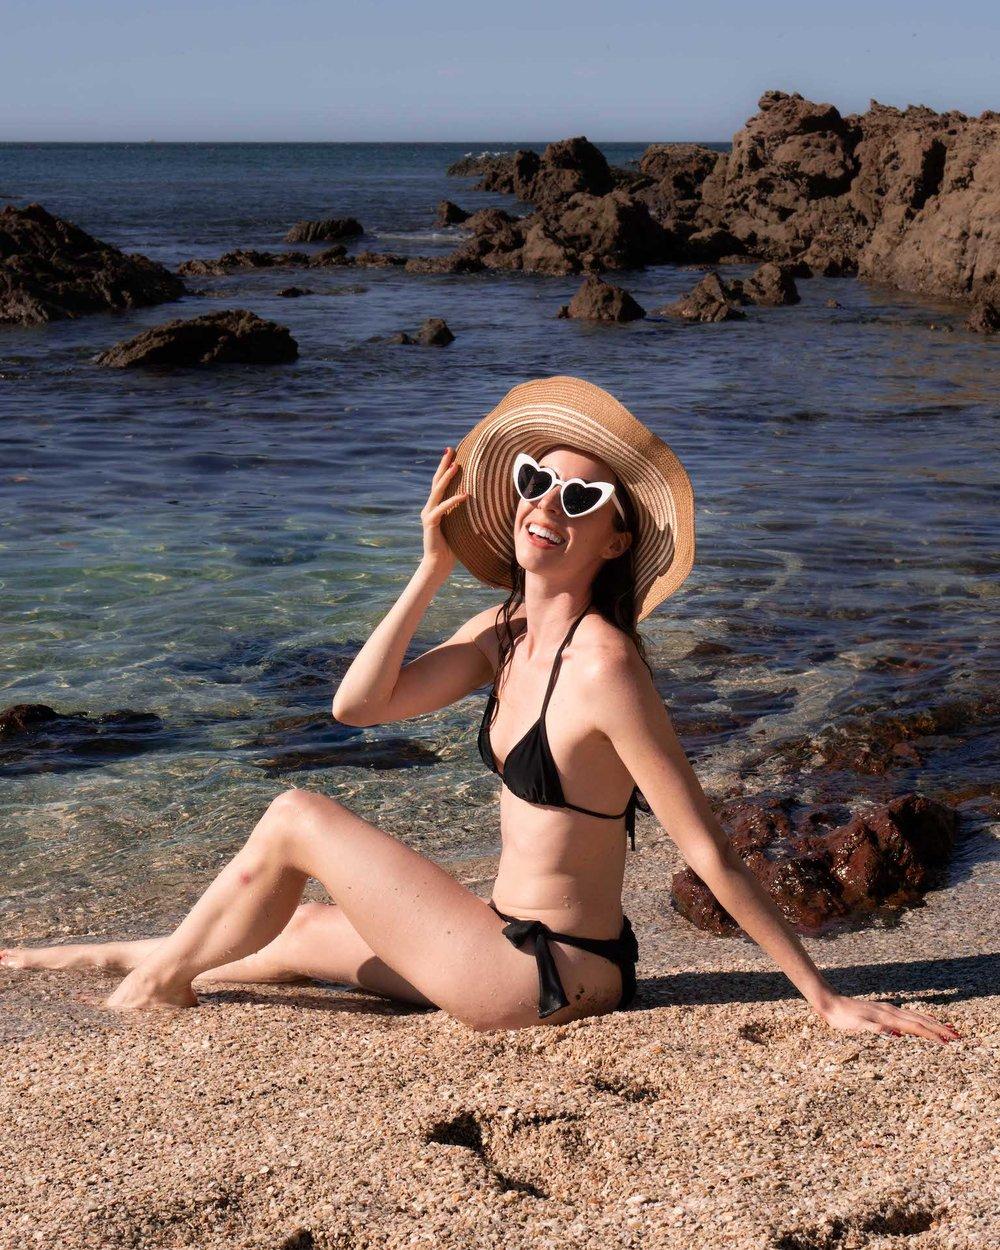 Sarah at Playa Conchal - Photo by Luis Yanes